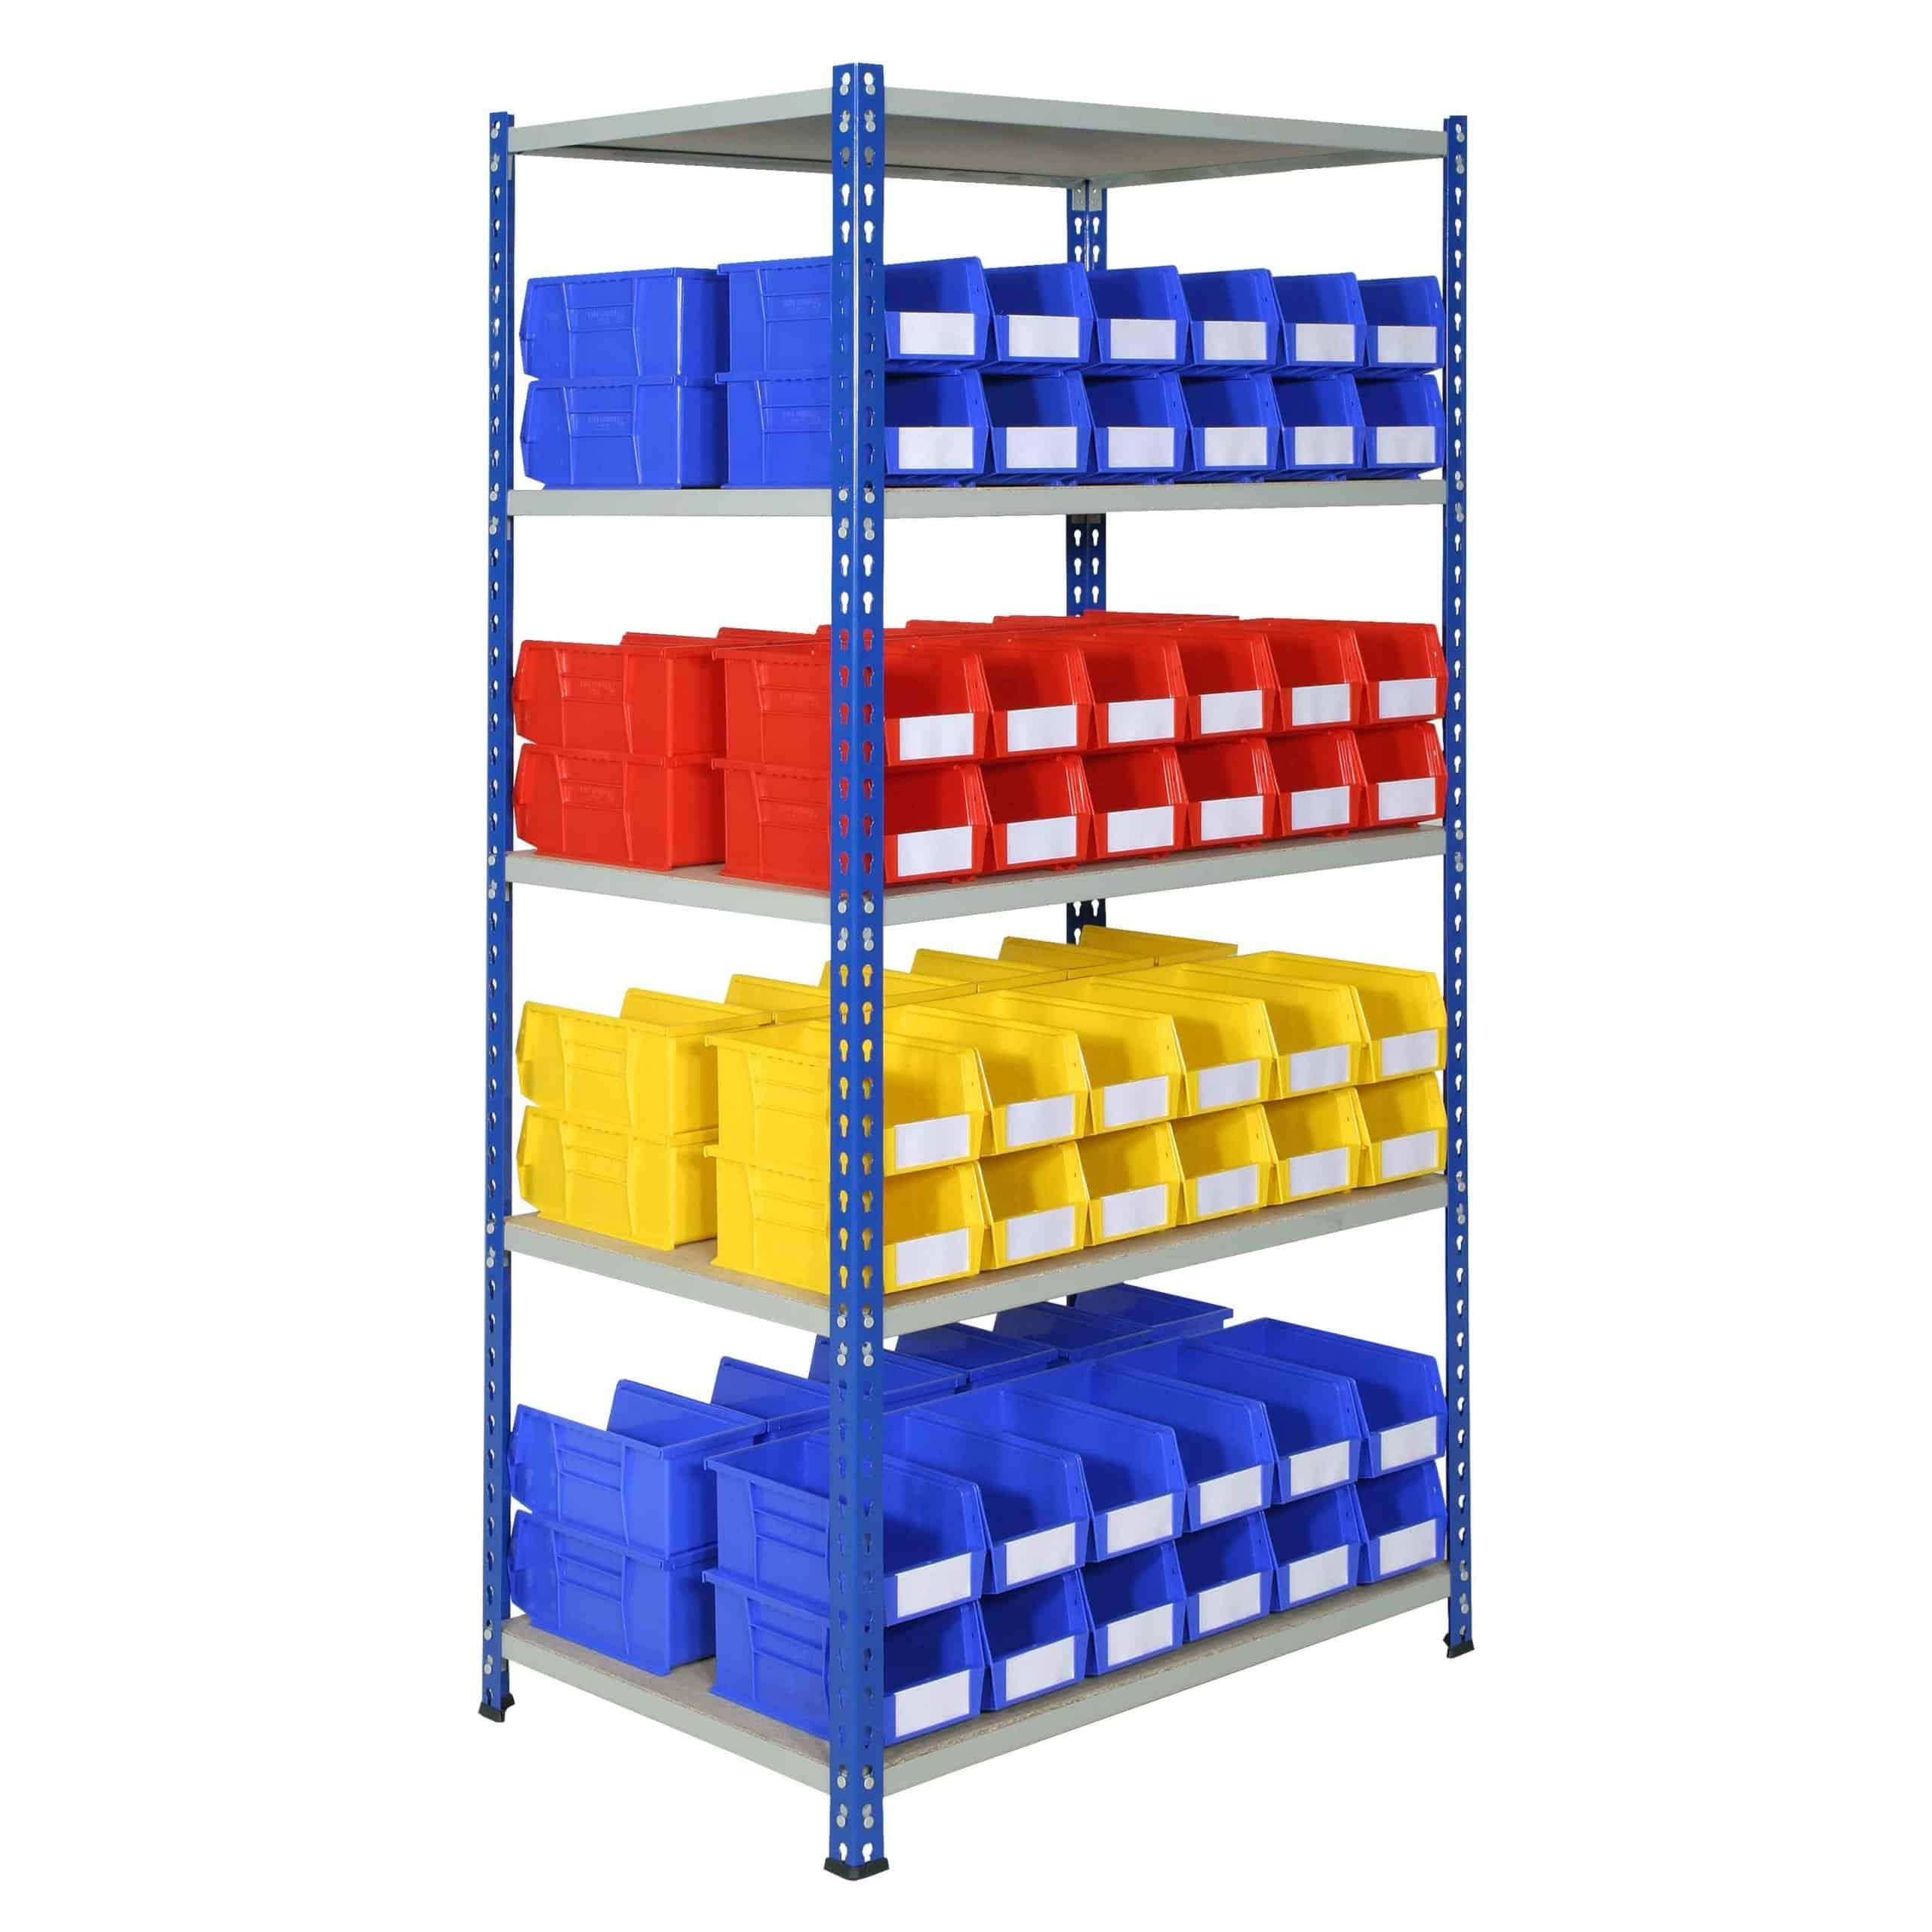 J Rivet Shelving with 96 Plastic Bins